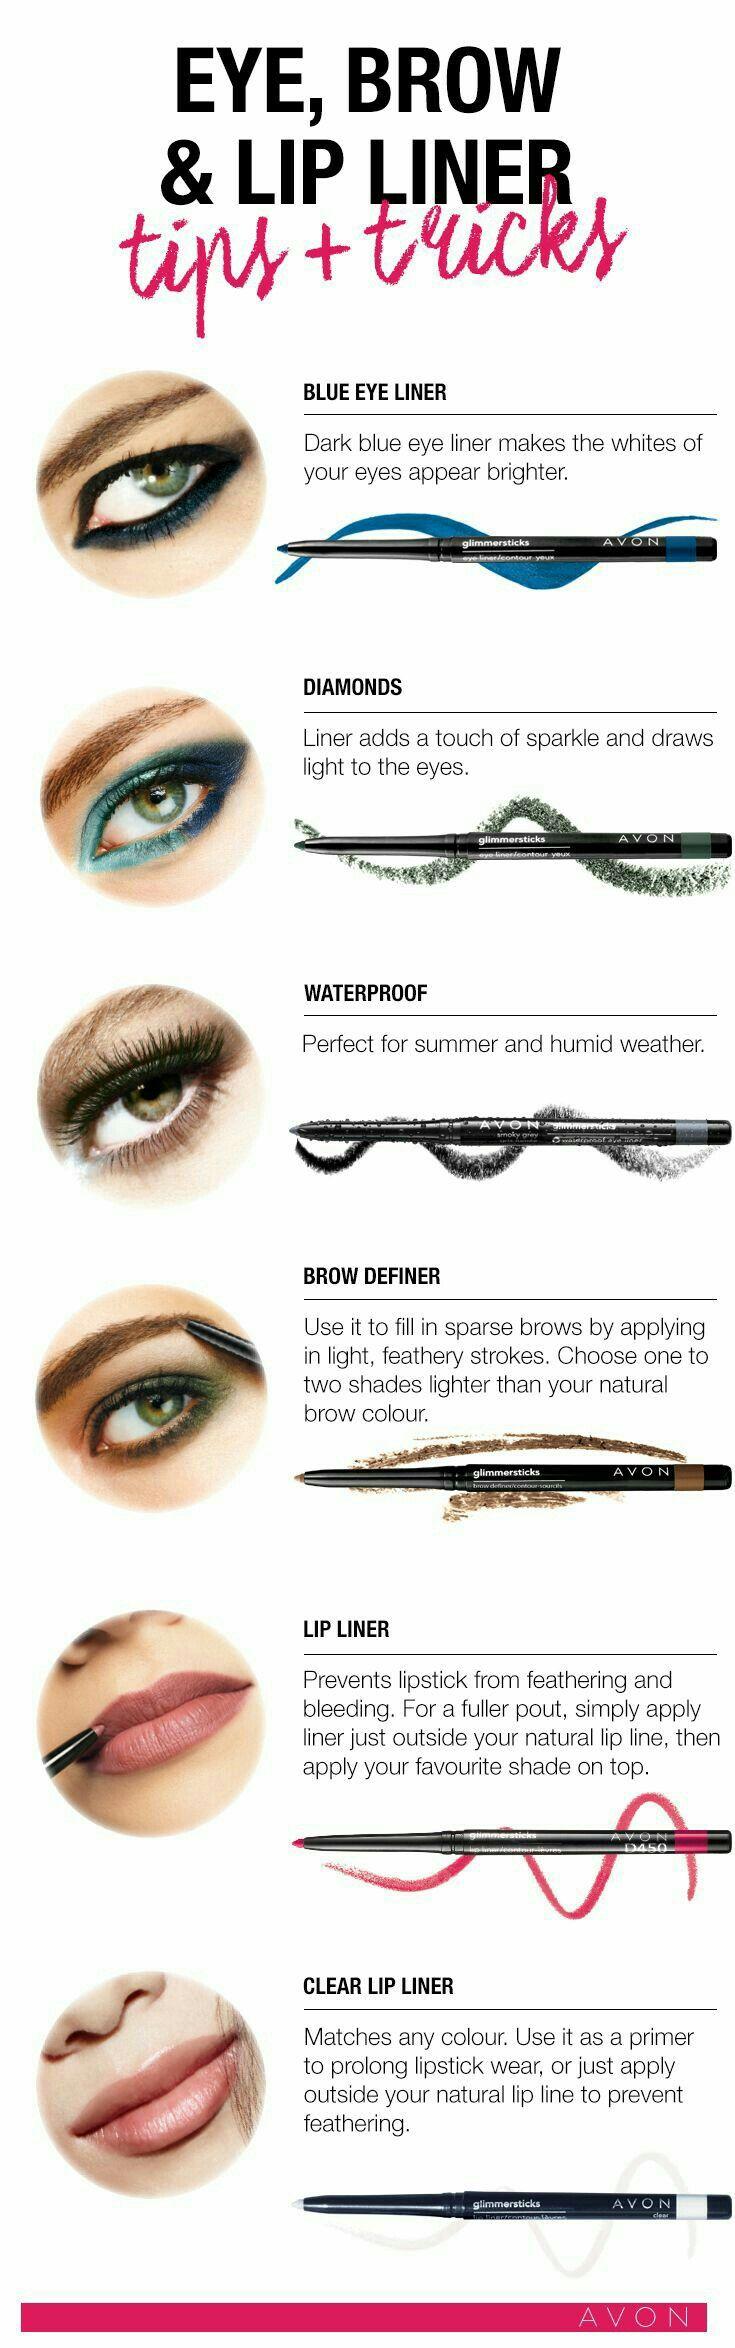 Liner Tips! Try Glimmersticks 1-888-801-6398 Hablo Espanol www.youravon.com/gdorse